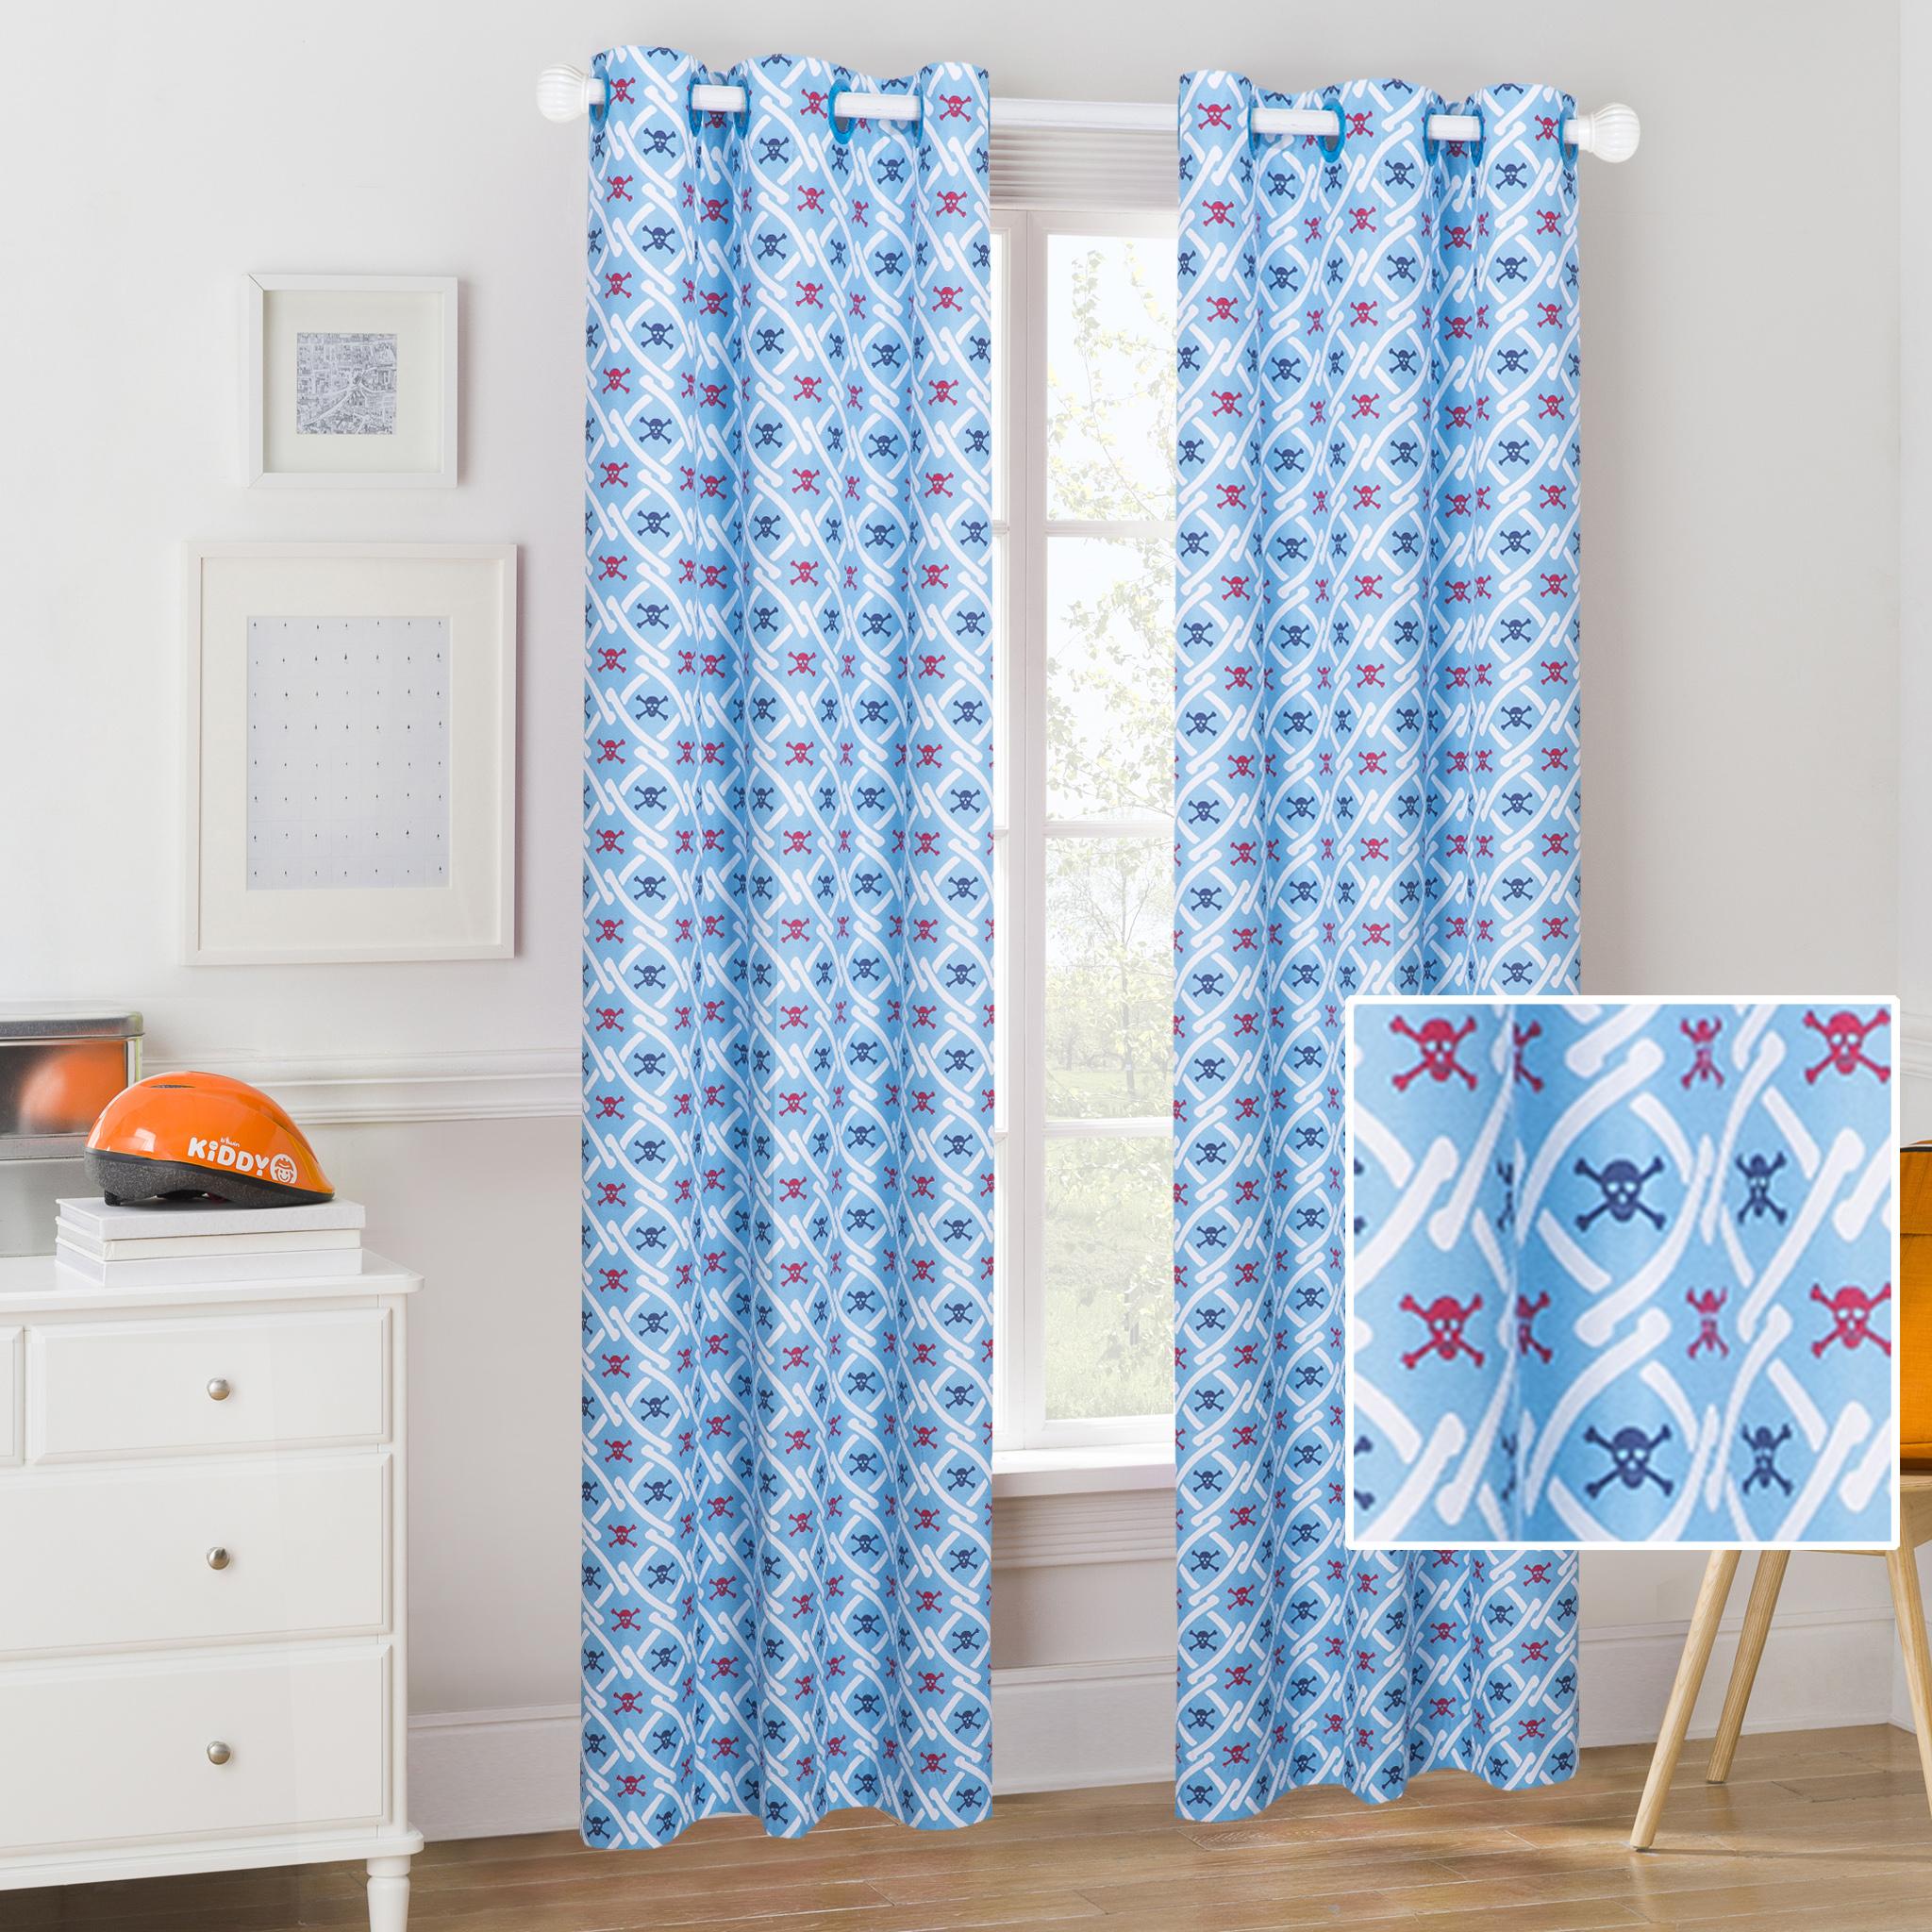 2-piece Mainstays Kids Pirates Room Darkening Coordinating Window Curtain (3 sizes) $10 ($5 each) + Free shipping w/ $35